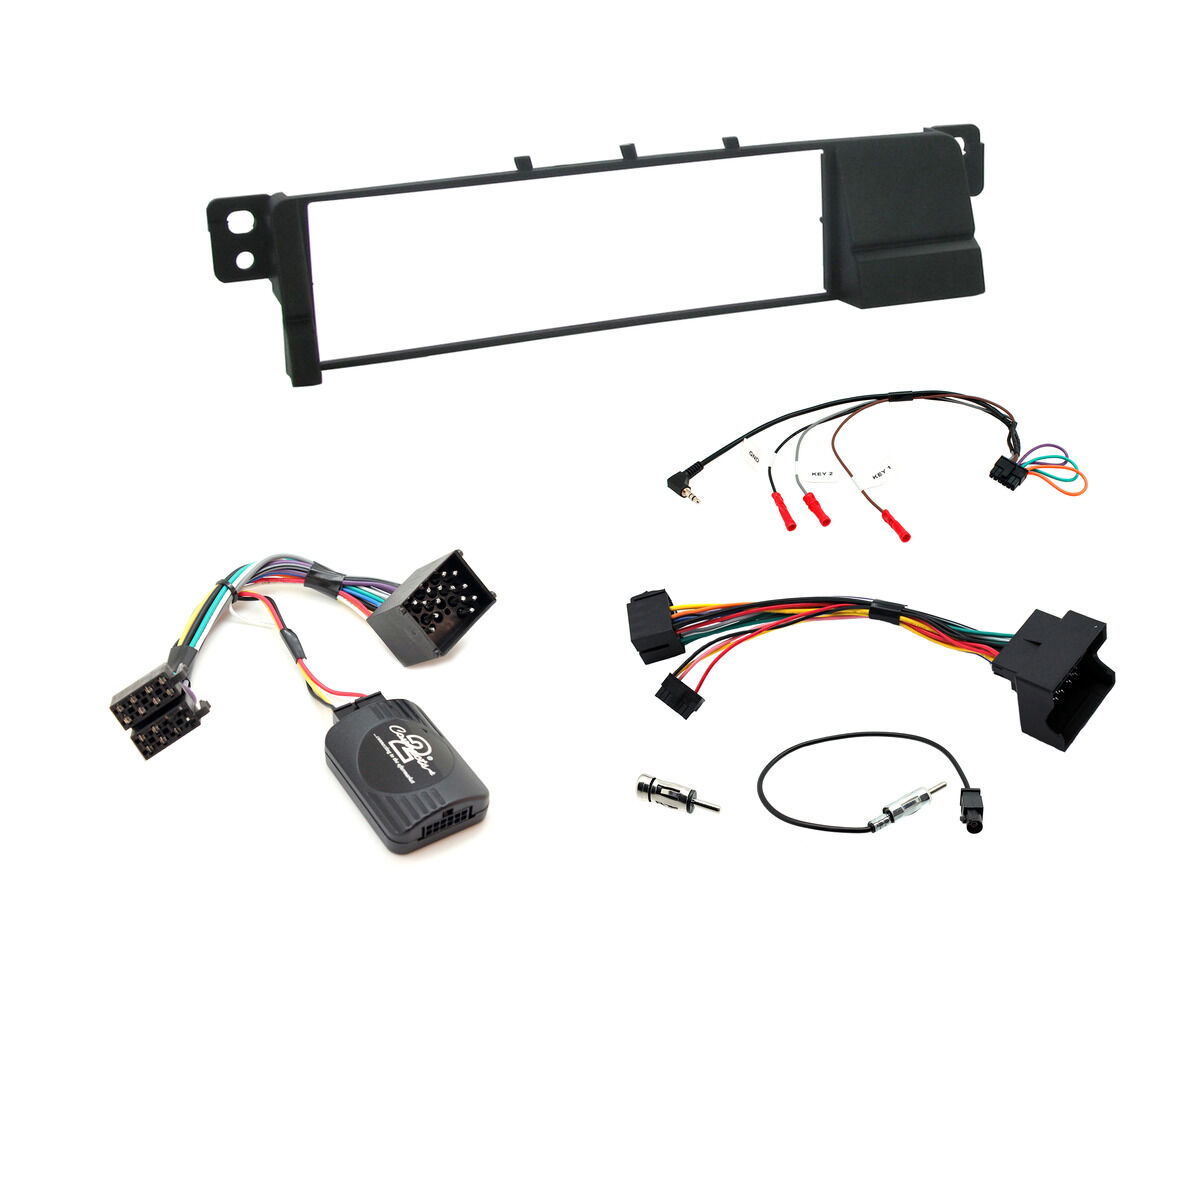 hight resolution of audio wiring kits supercheap auto australia mega audio wiring kit audio wiring kit